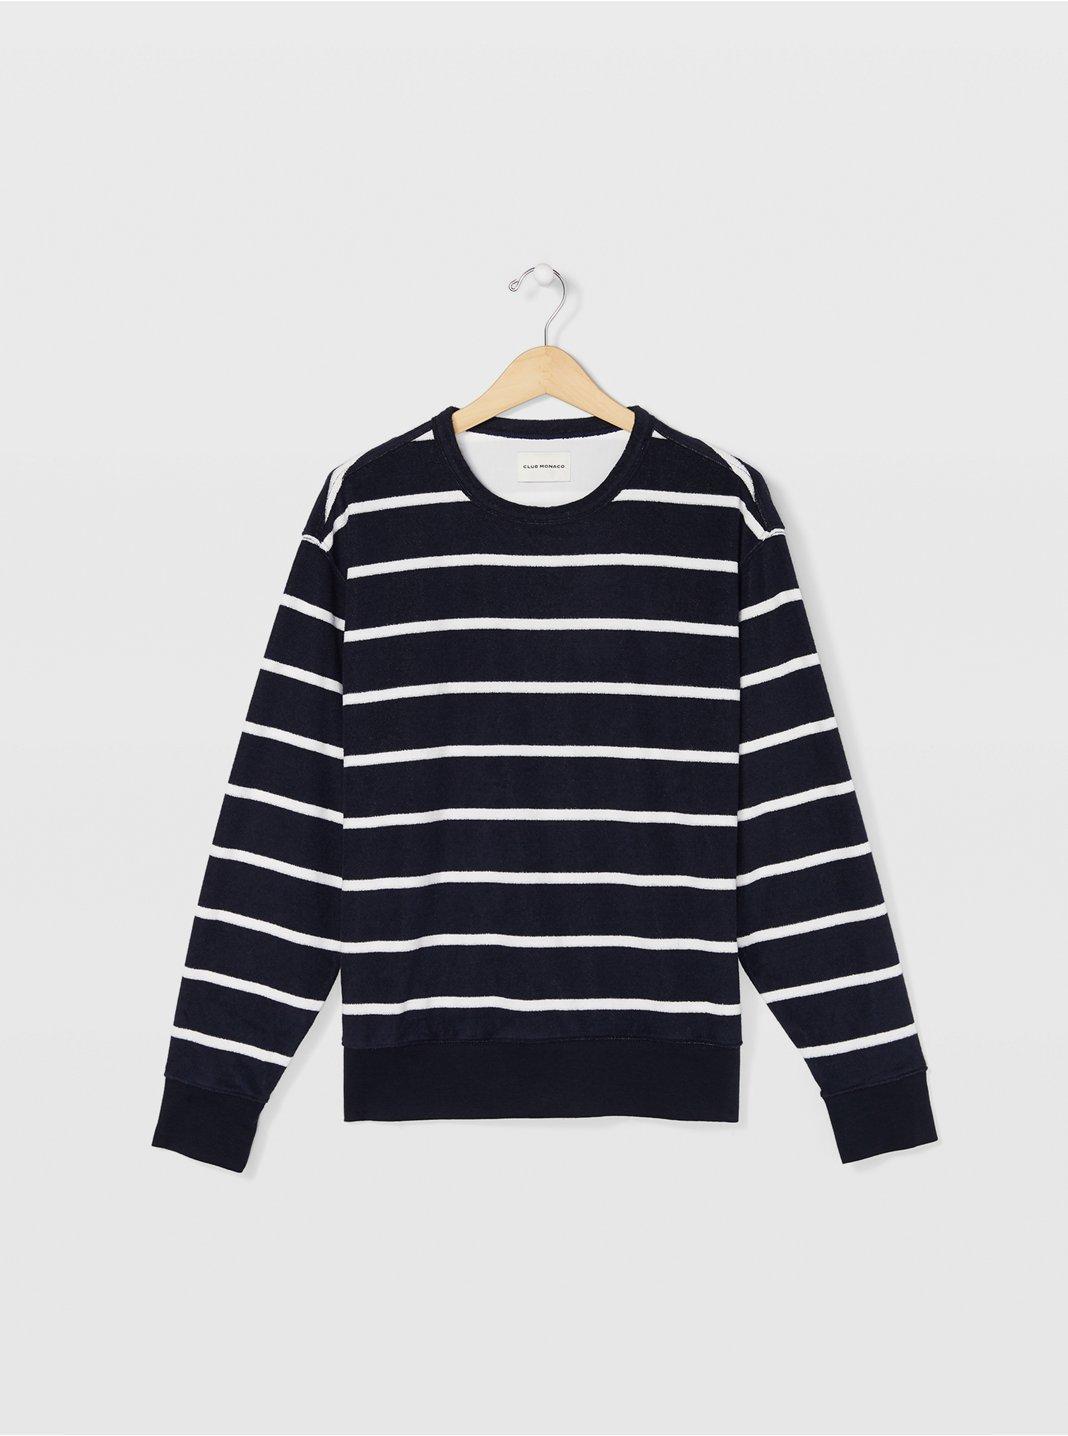 Striped Terry Sweatshirt